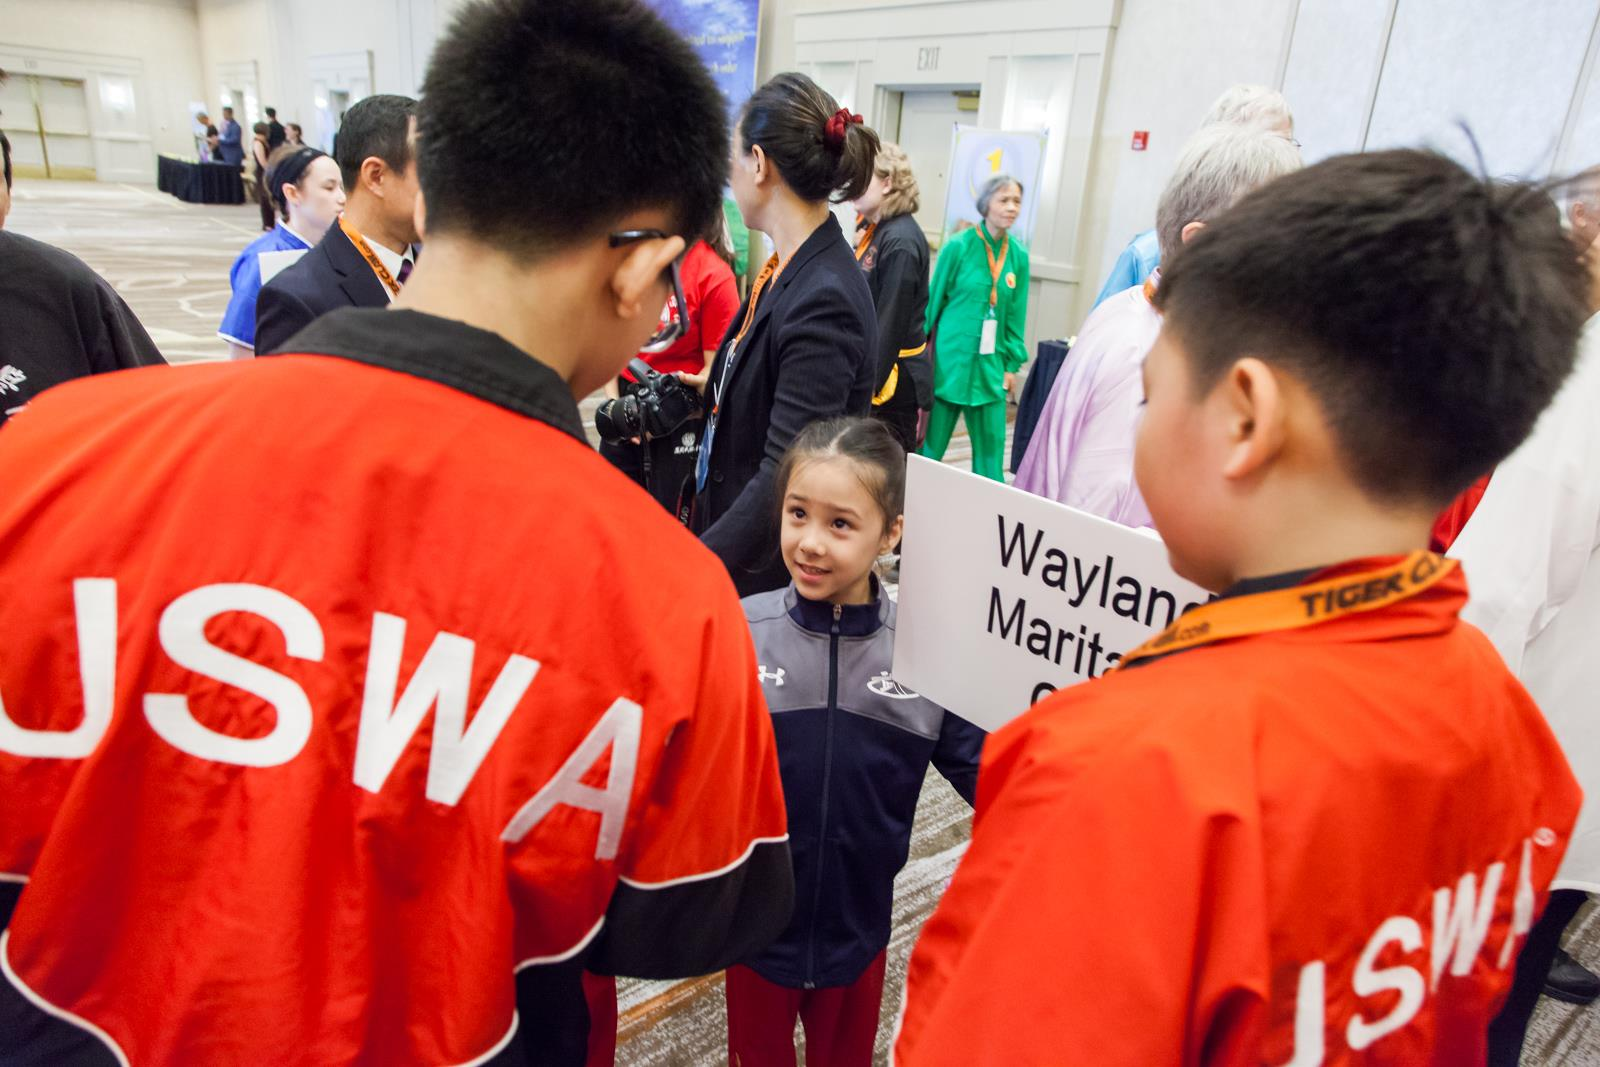 wayland-li-wushu-us-challenge-competition-maryland-2017-6.jpg